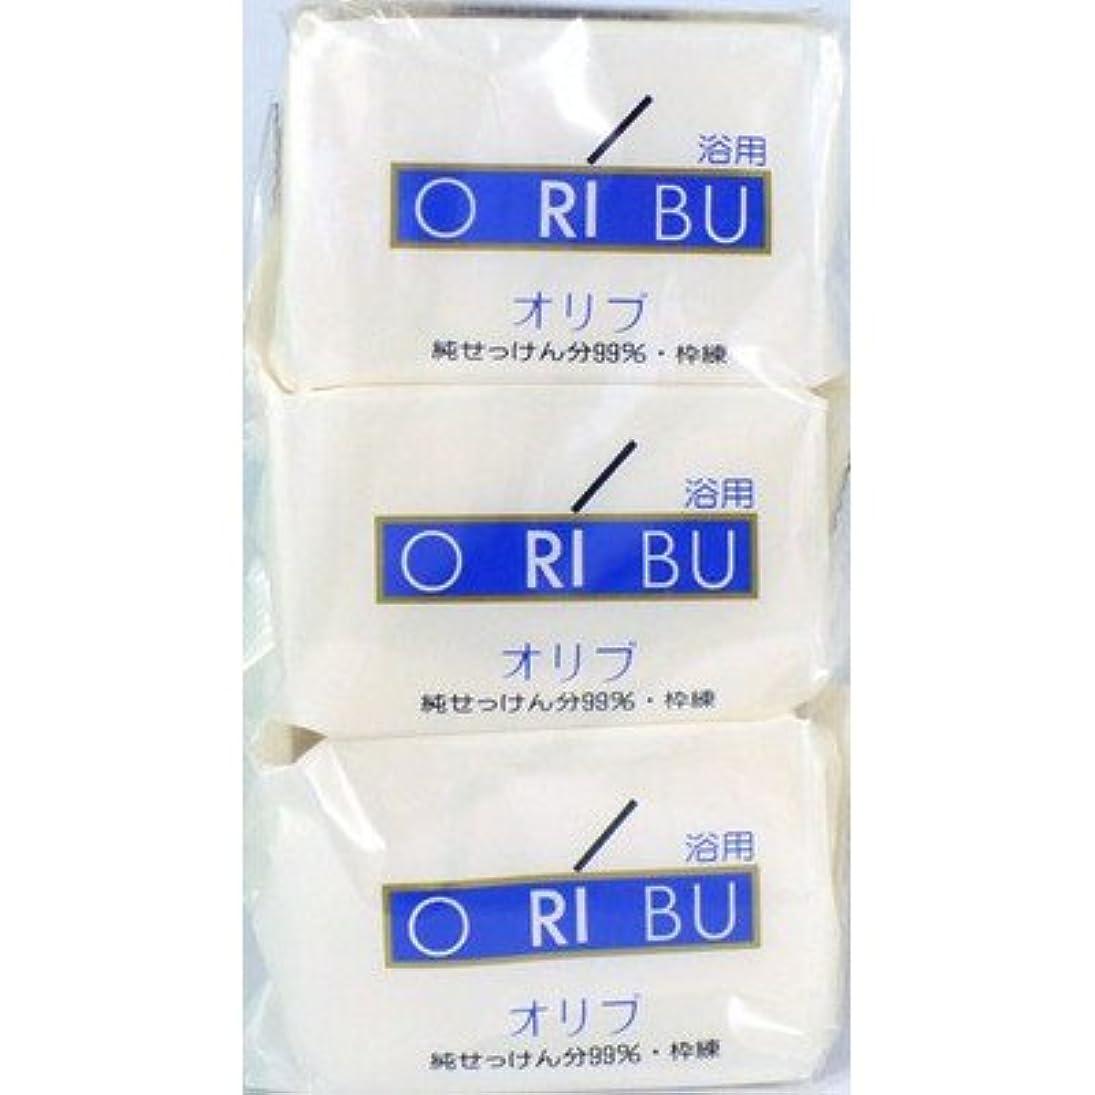 背骨終点患者暁石鹸 ORIBU オリブ 浴用石鹸 110g 3個入り